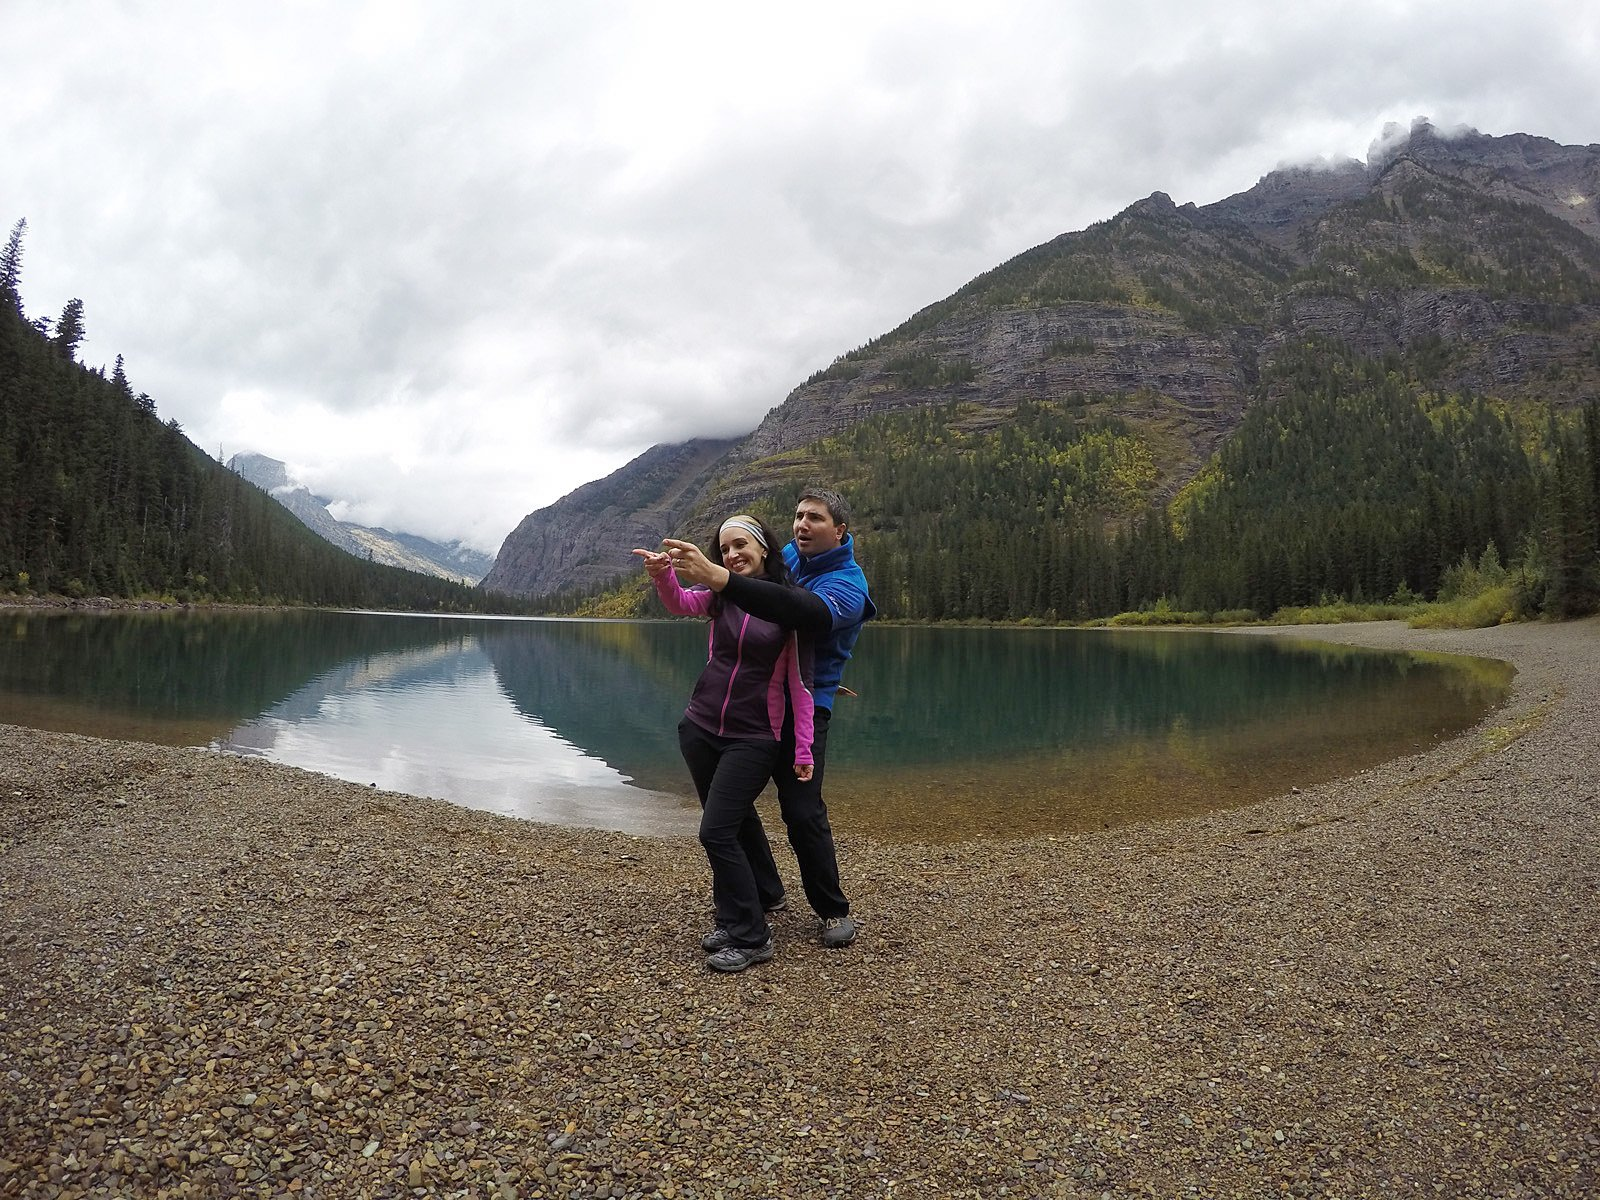 glacier national park is a must